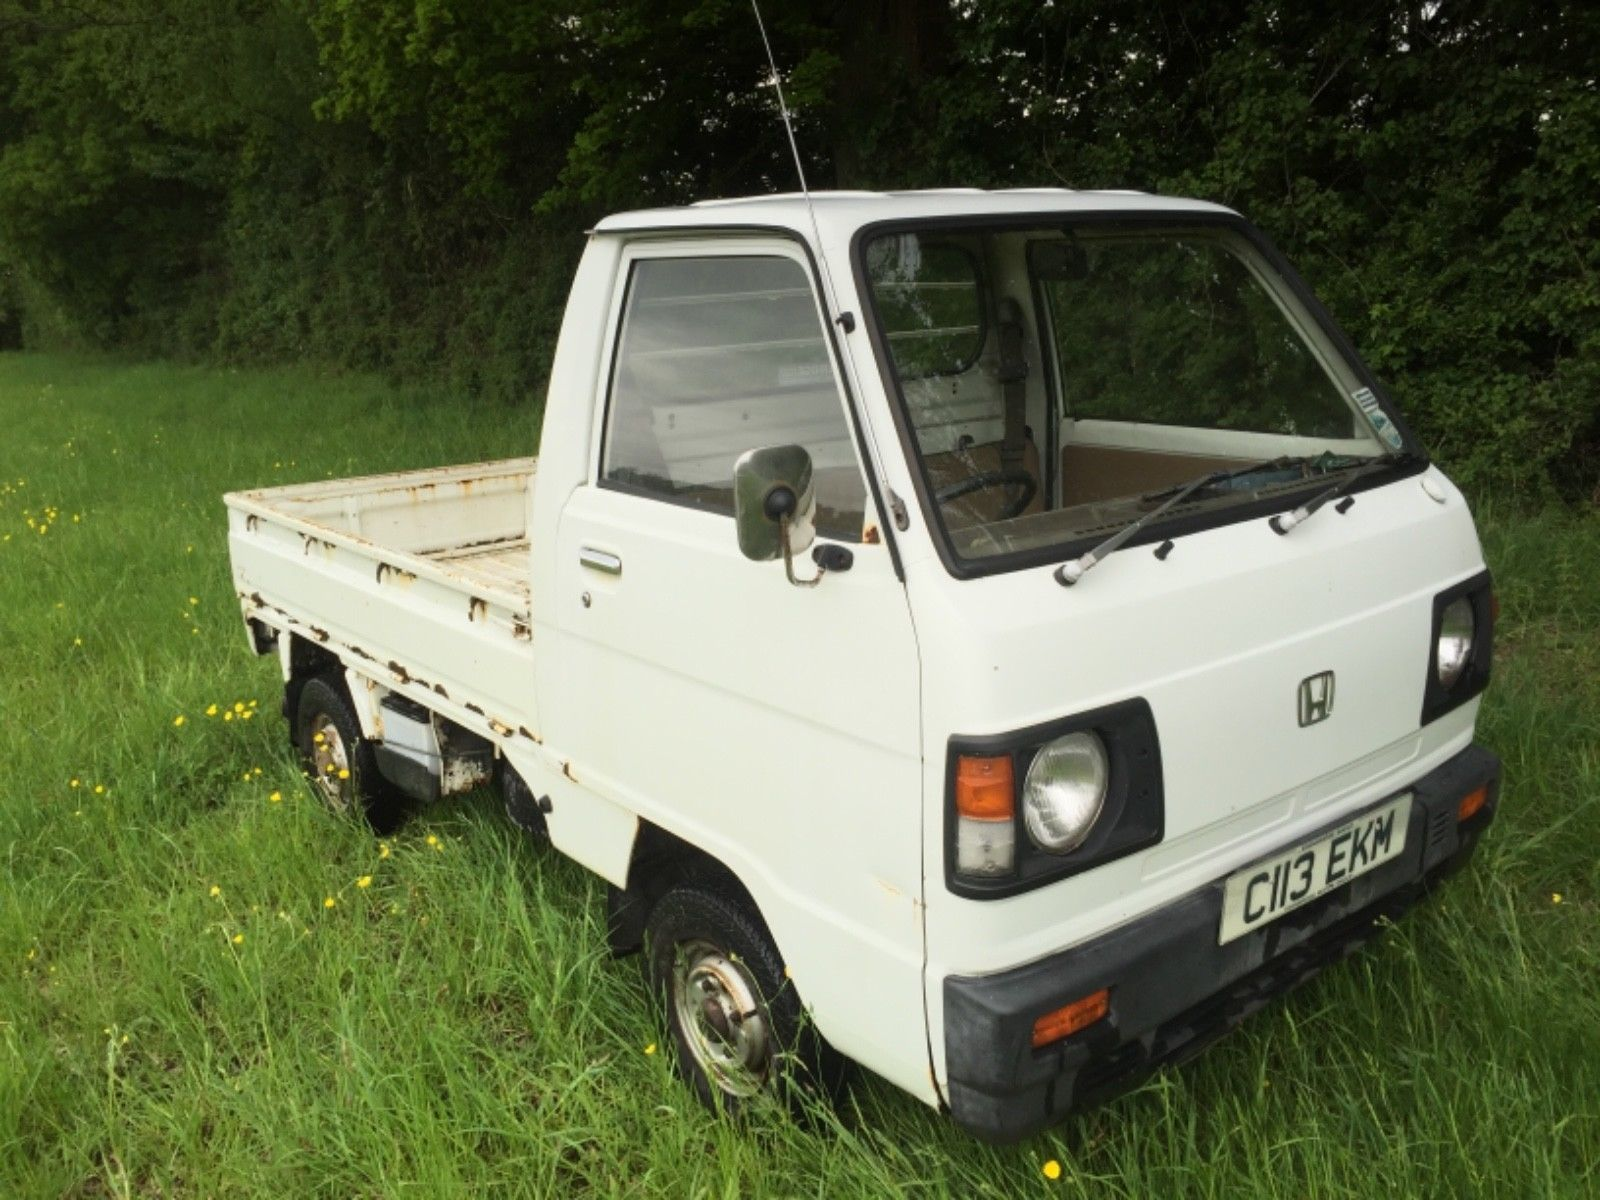 Ebay Honda Acty Mini Truck Kei Vehicle Clic Van Cliccars Cars